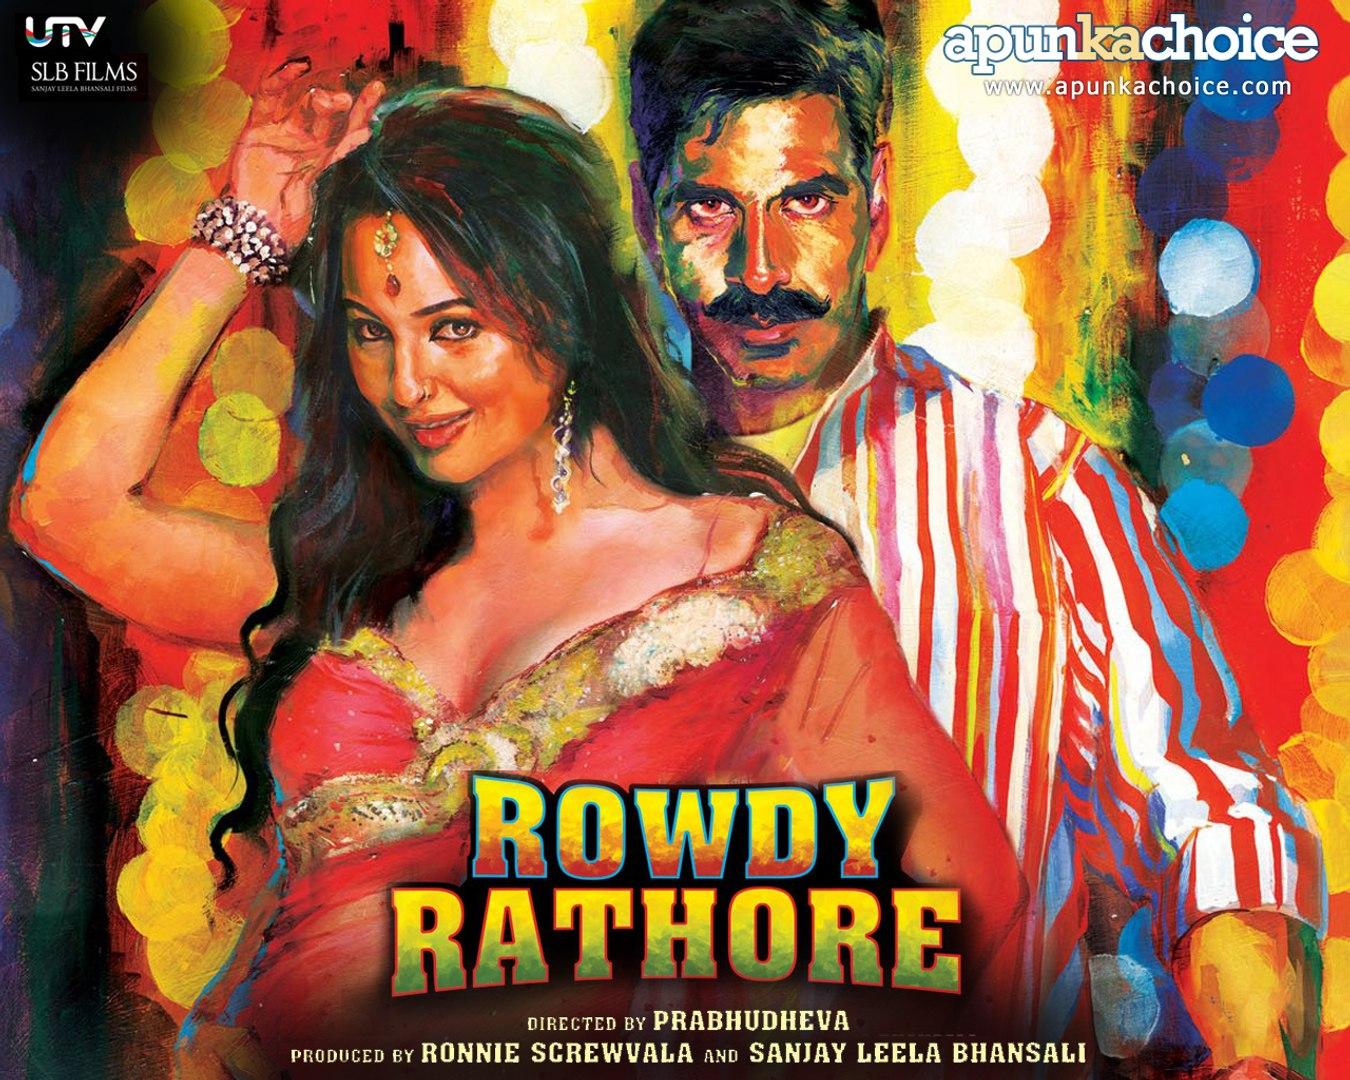 rowdy rathore full movie watch online free